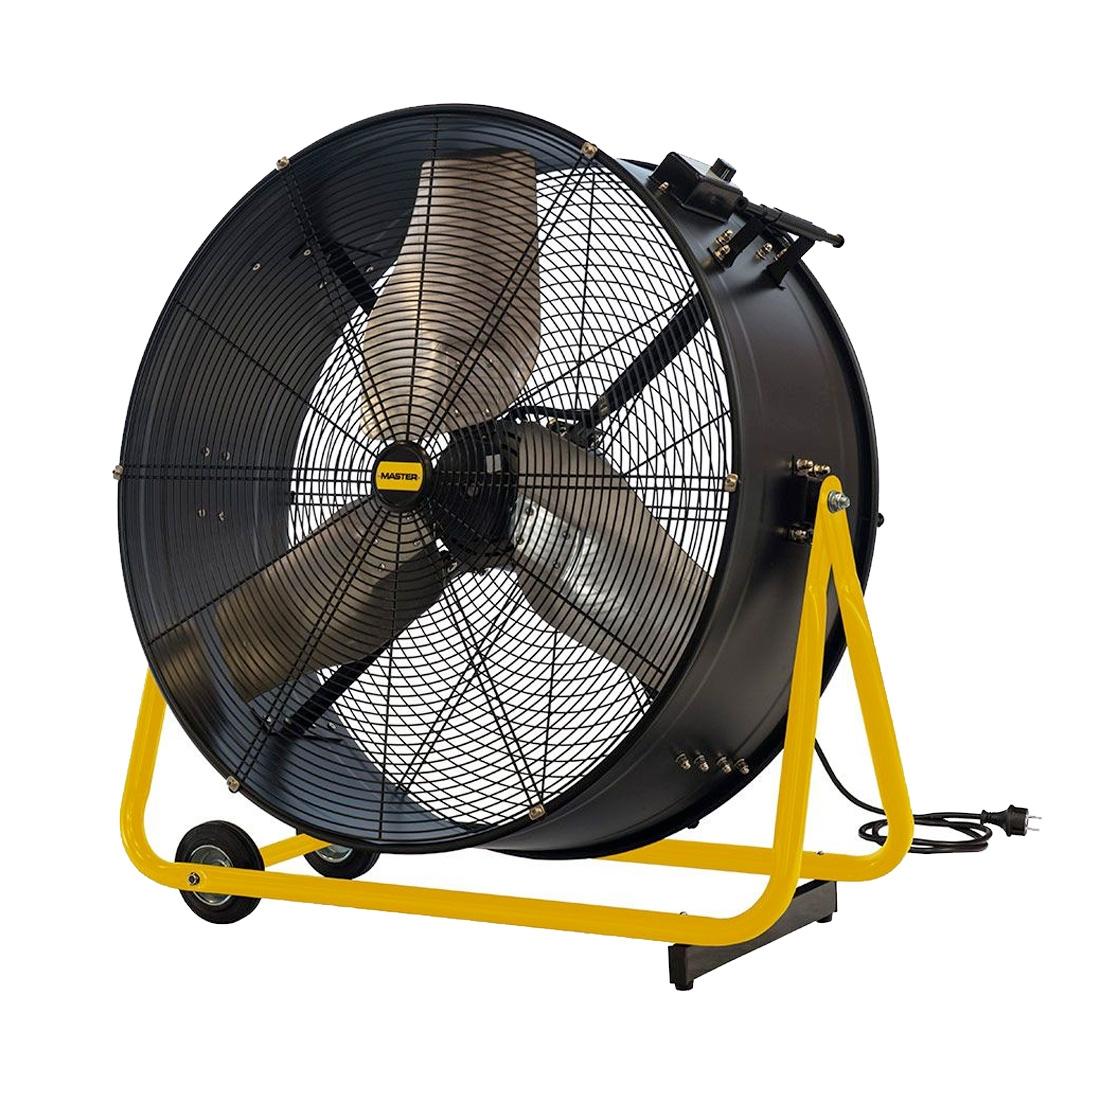 Ventilateur industriel Master DF 36